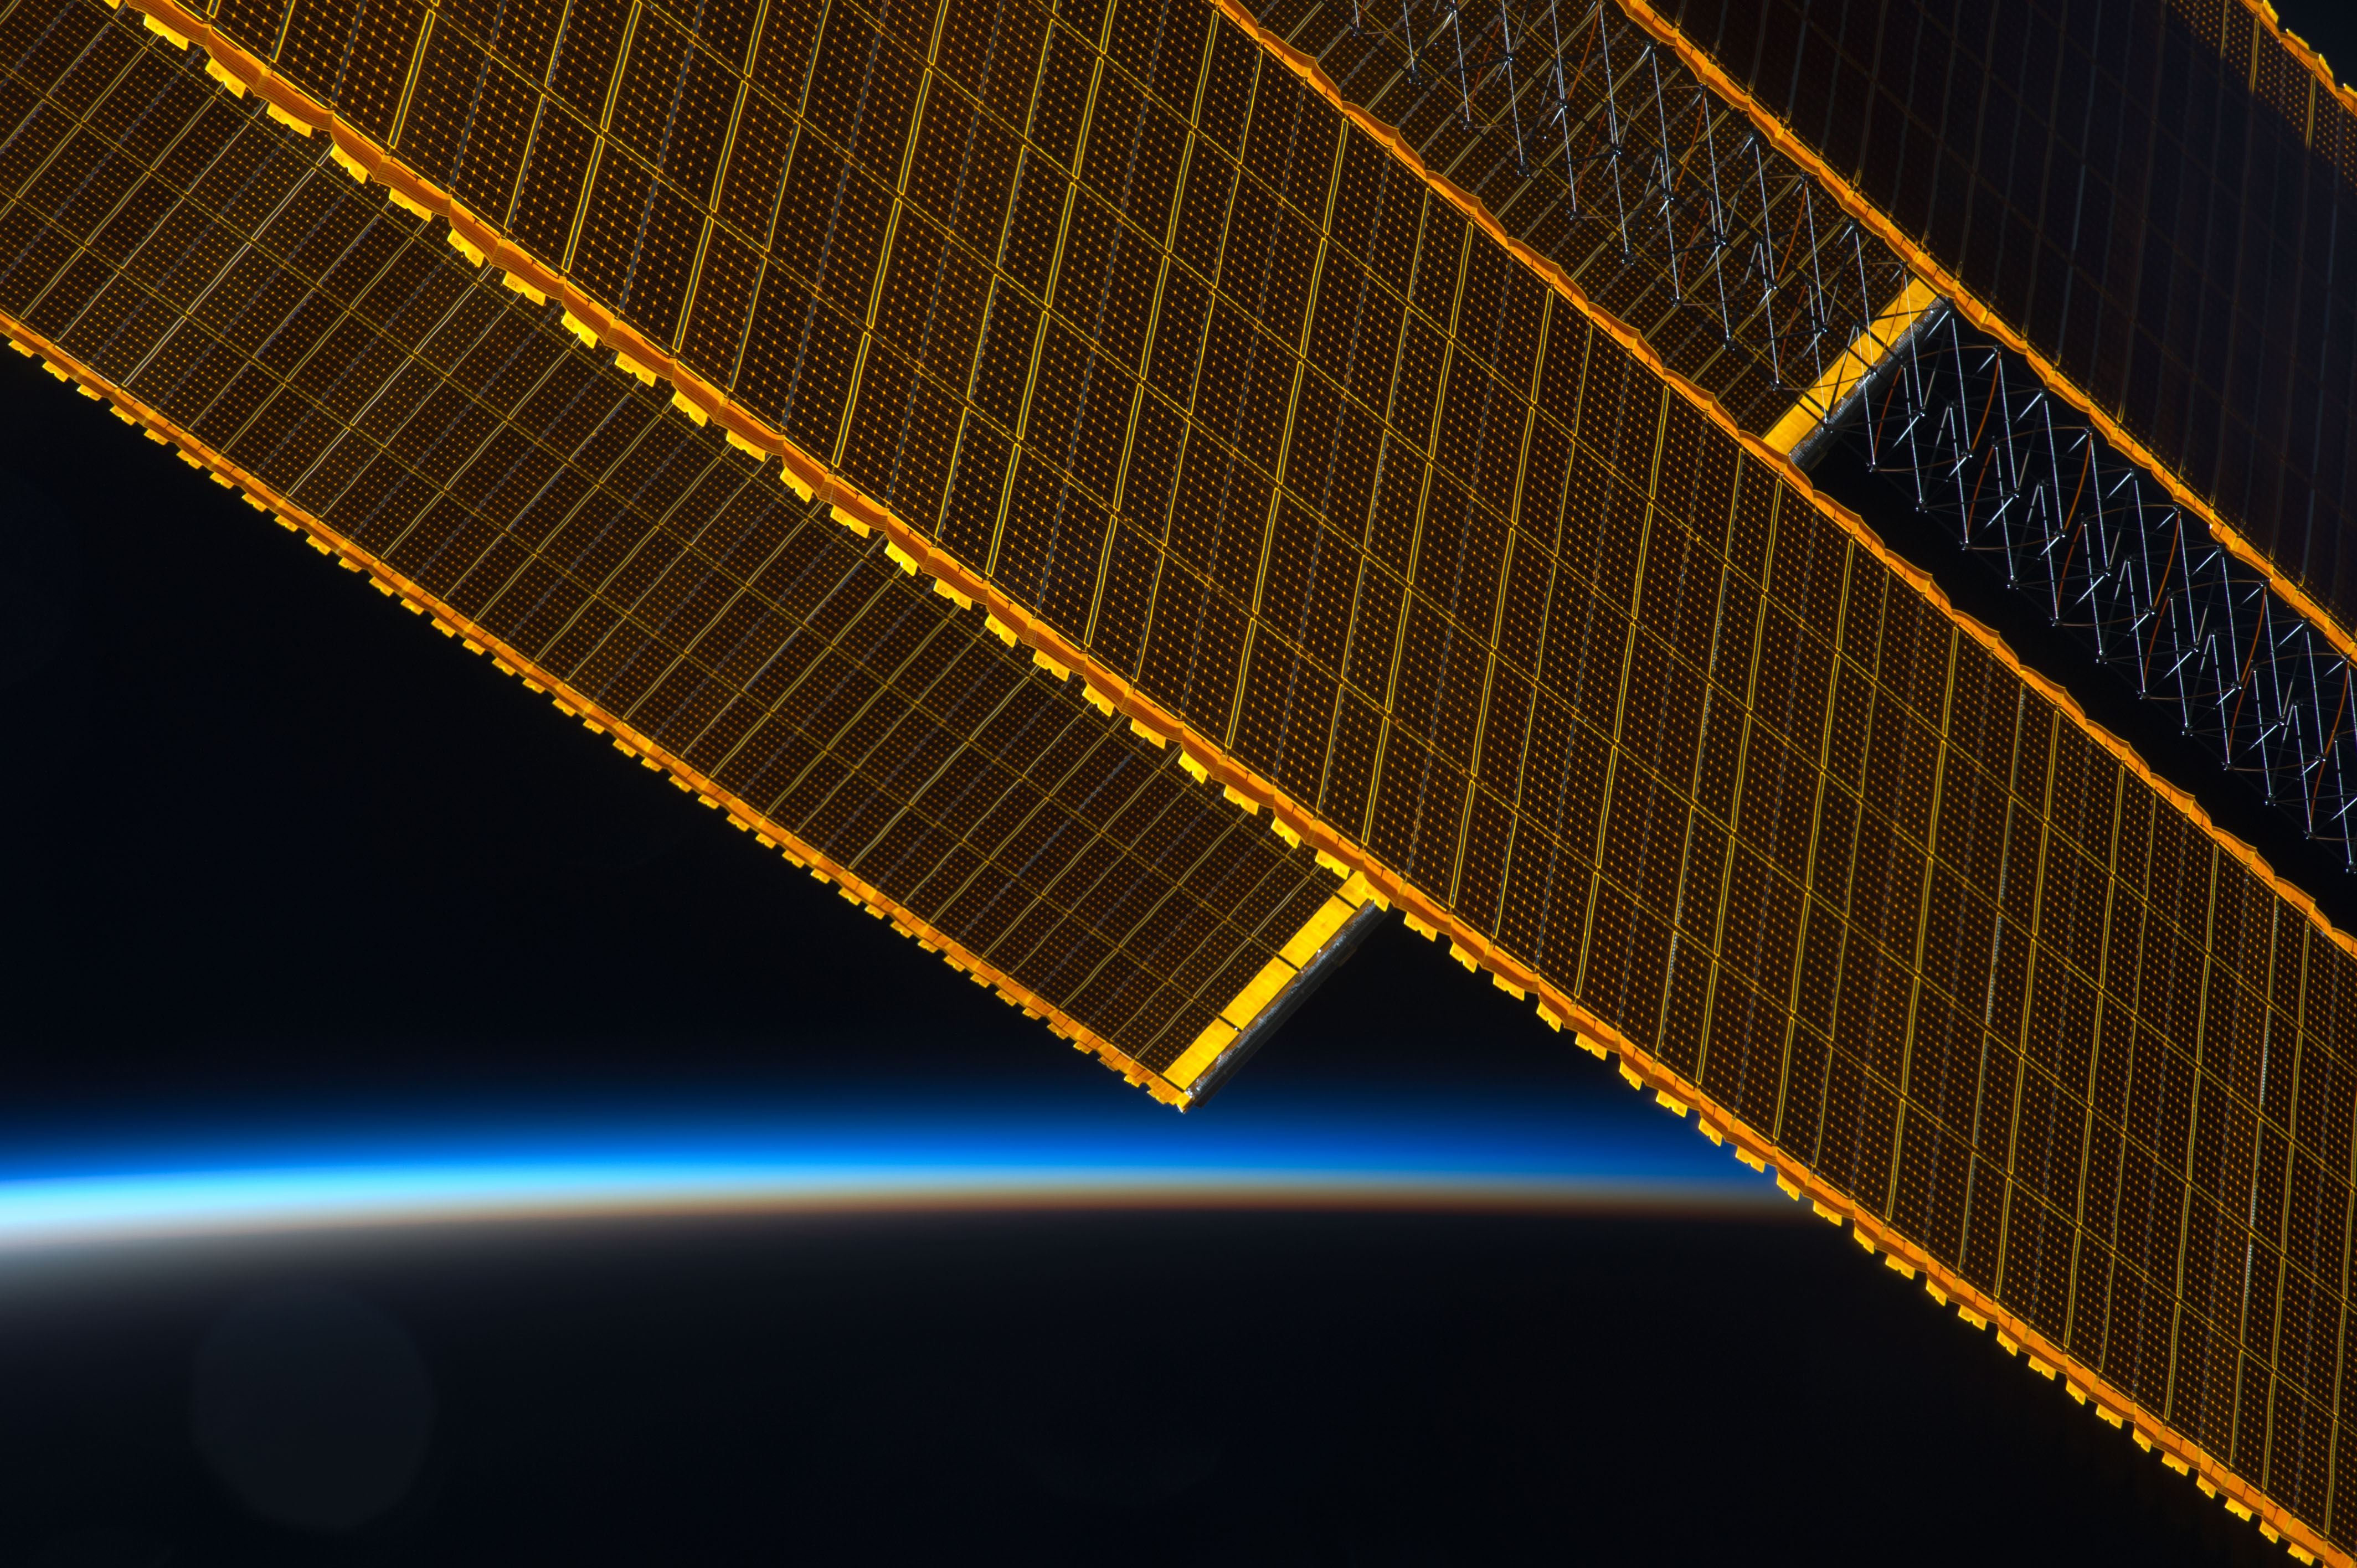 nasa solar panel - photo #29